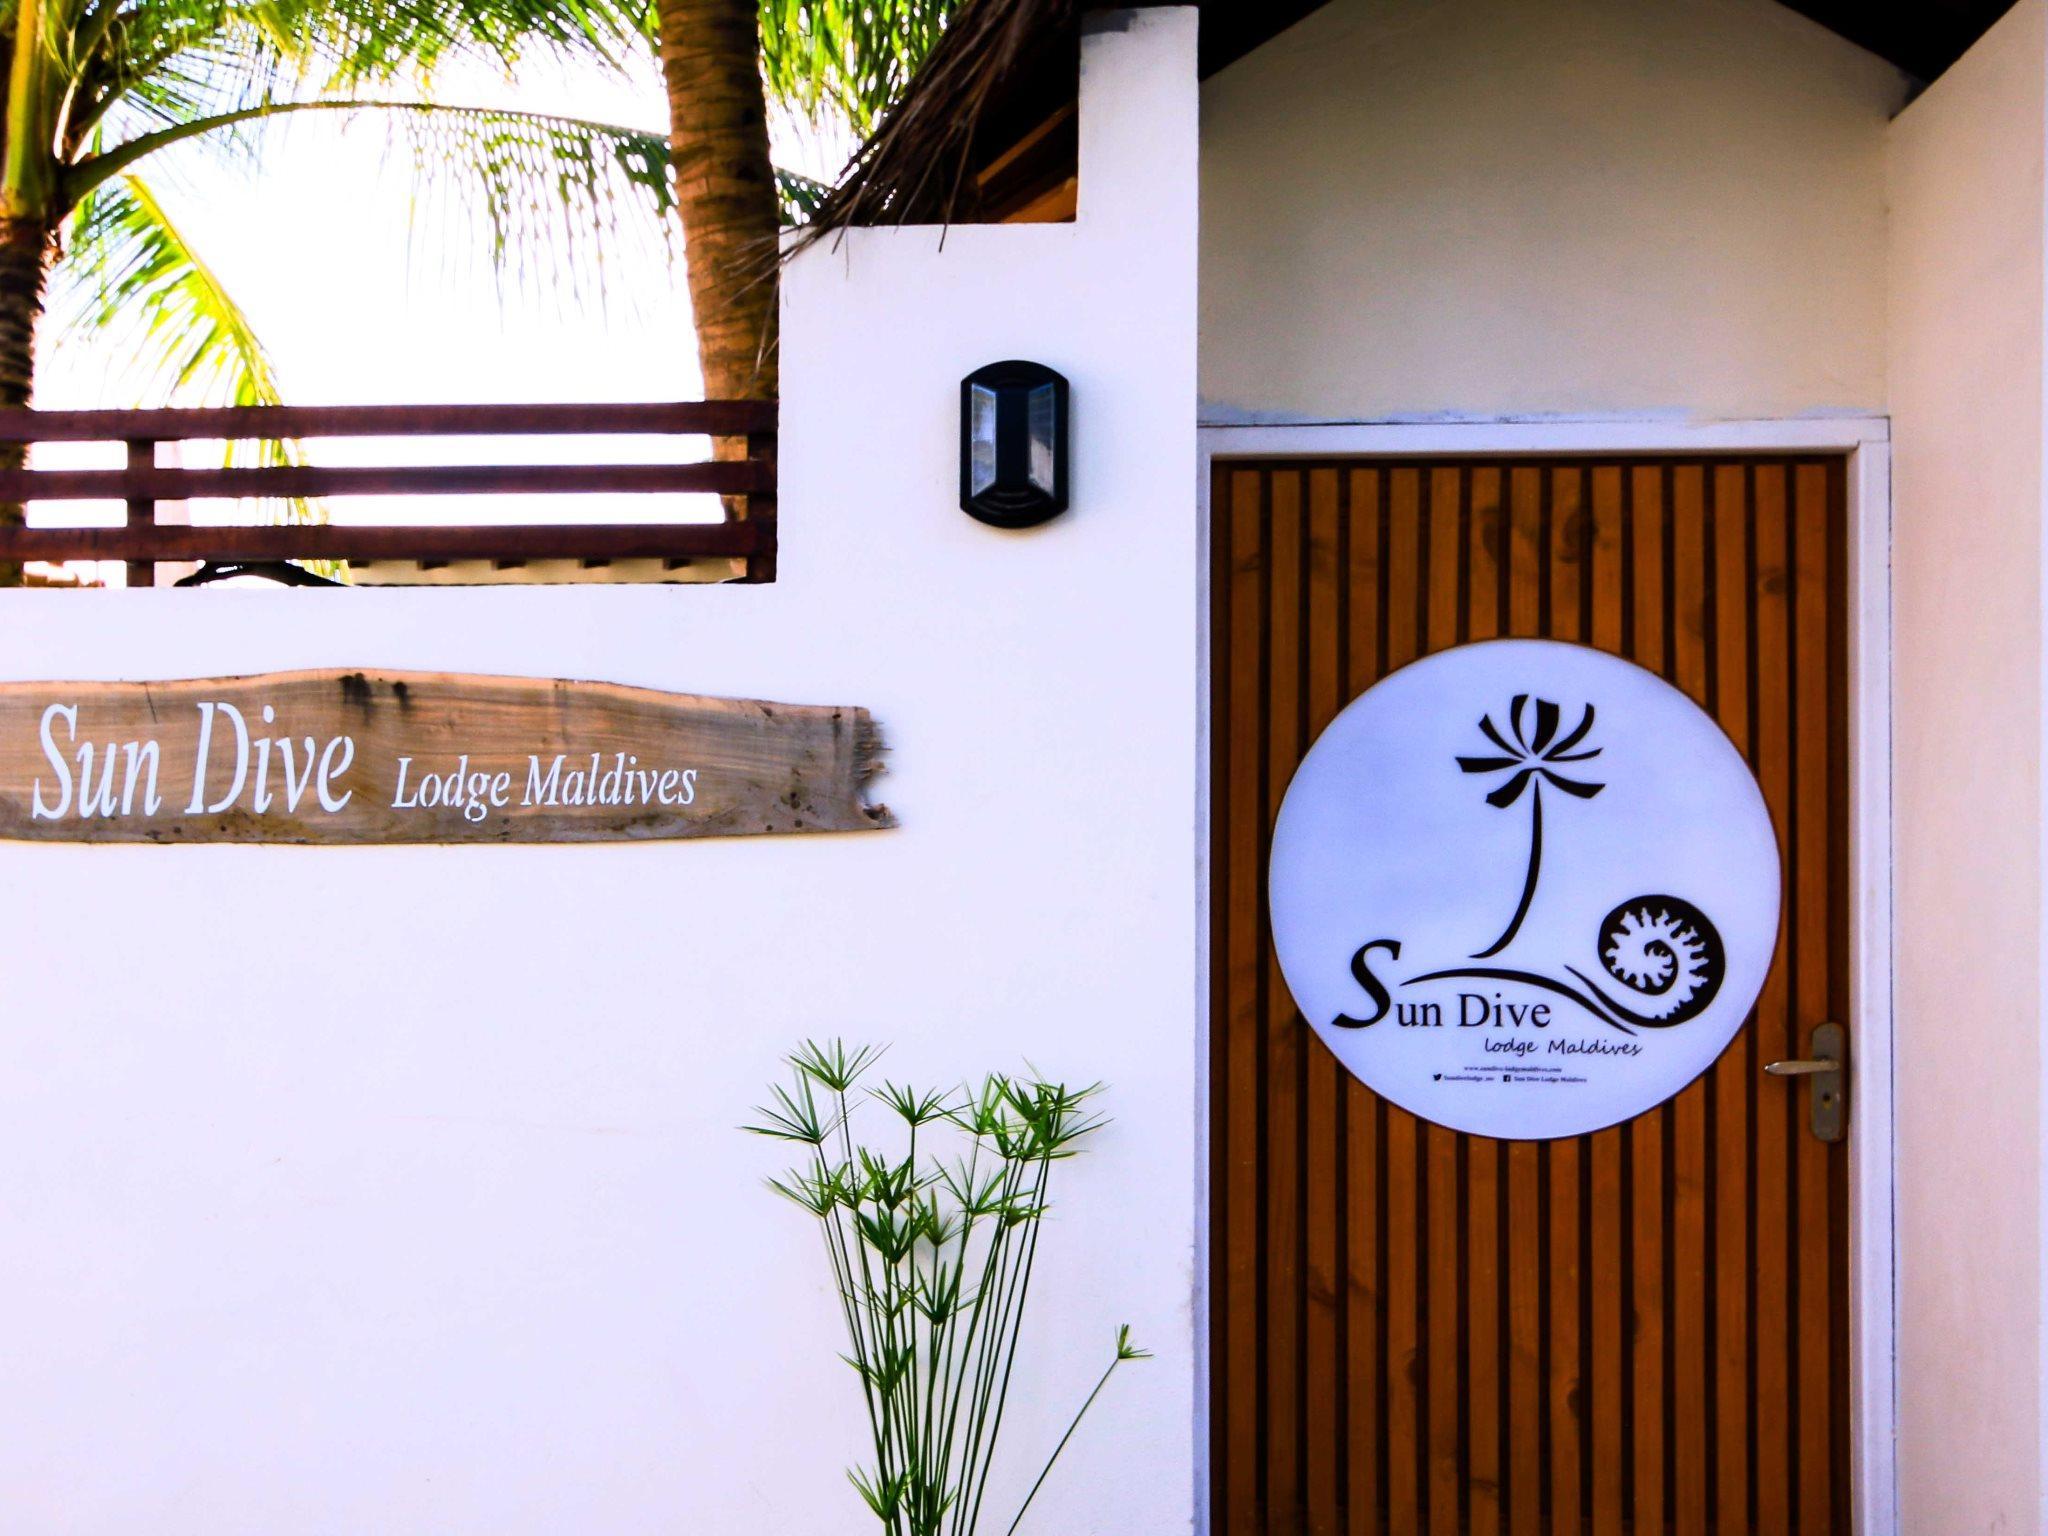 Sundive Lodge Maldives